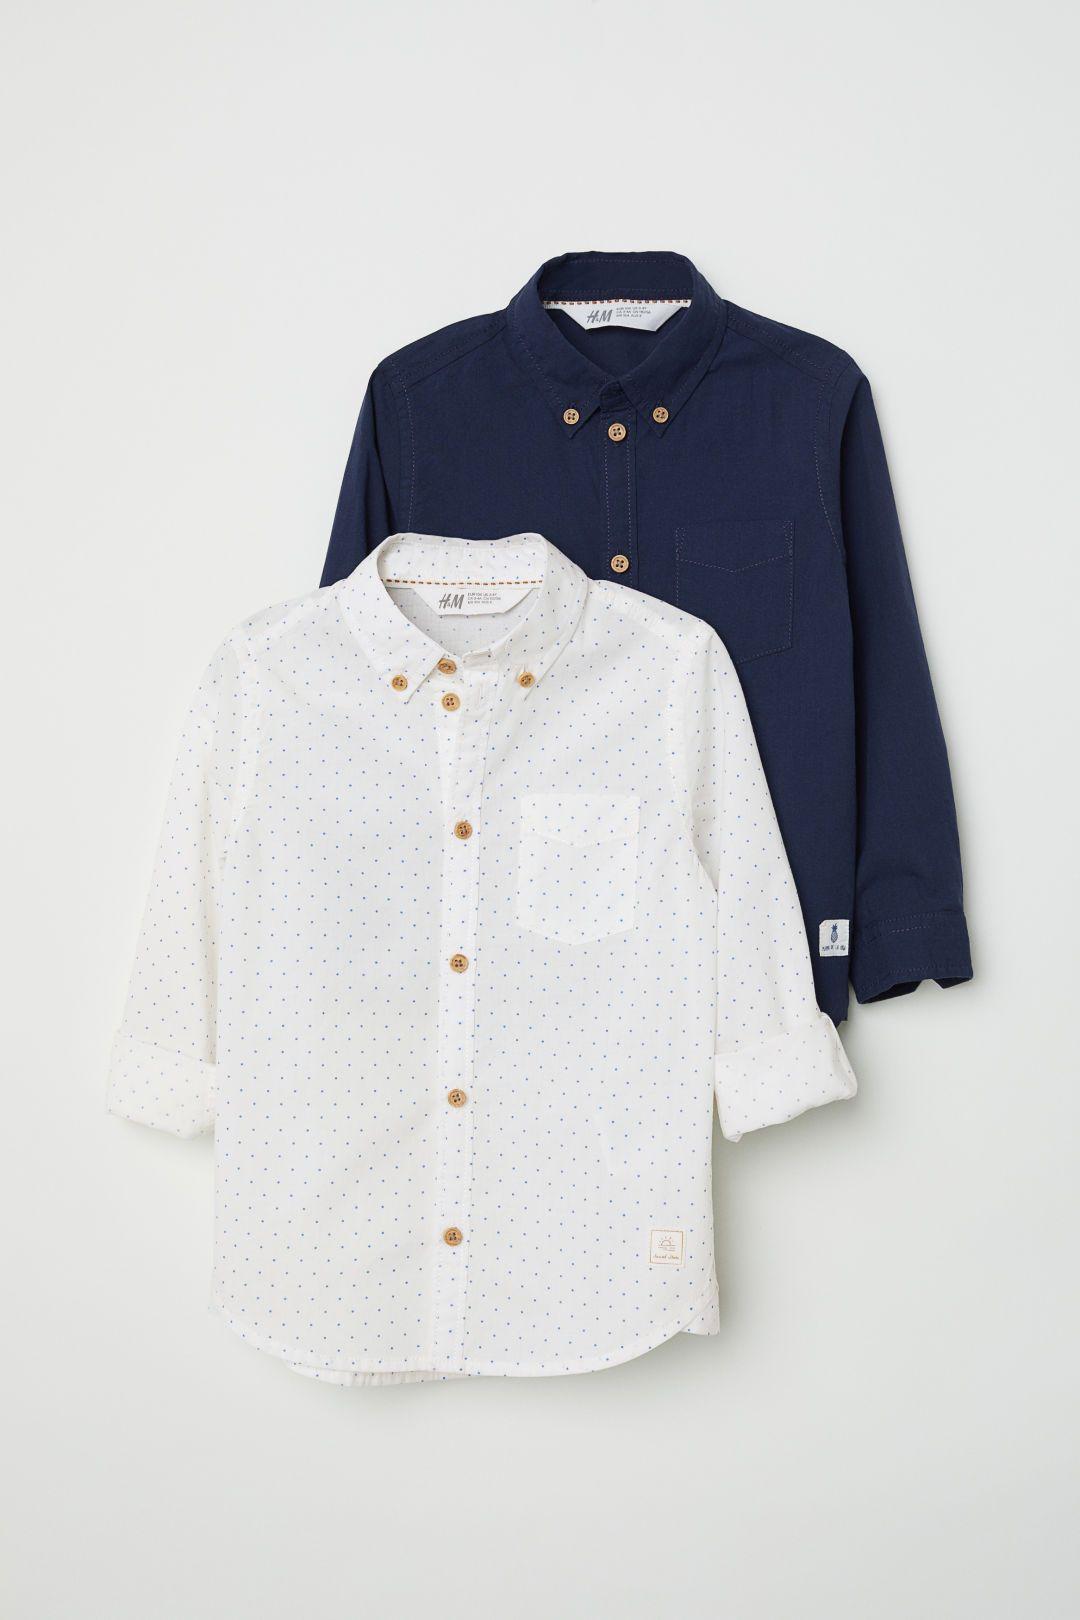 b0523e4c5b8 2-pack Cotton Shirts - Dark blue - Kids